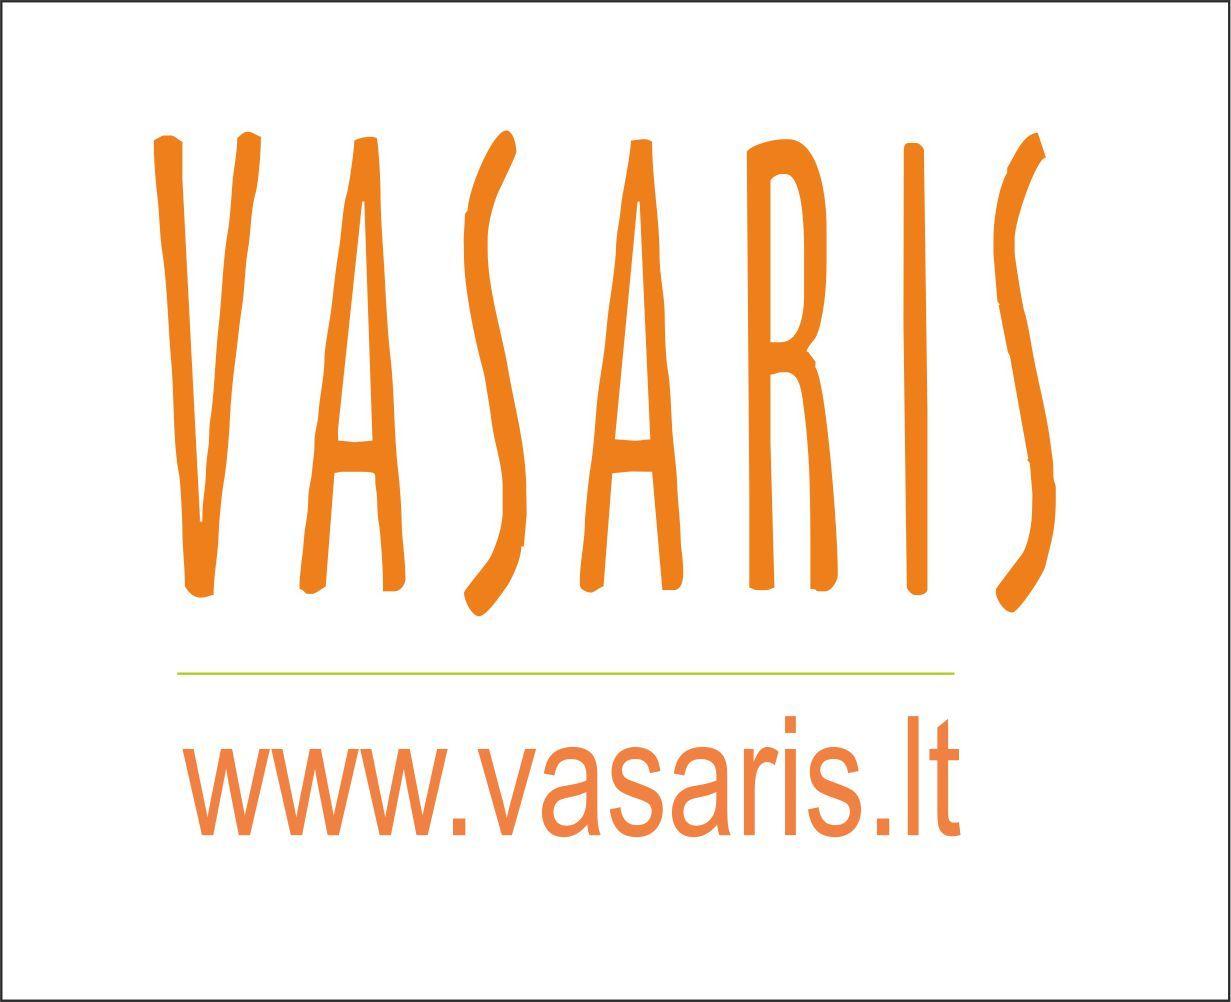 vasaris_logotipas